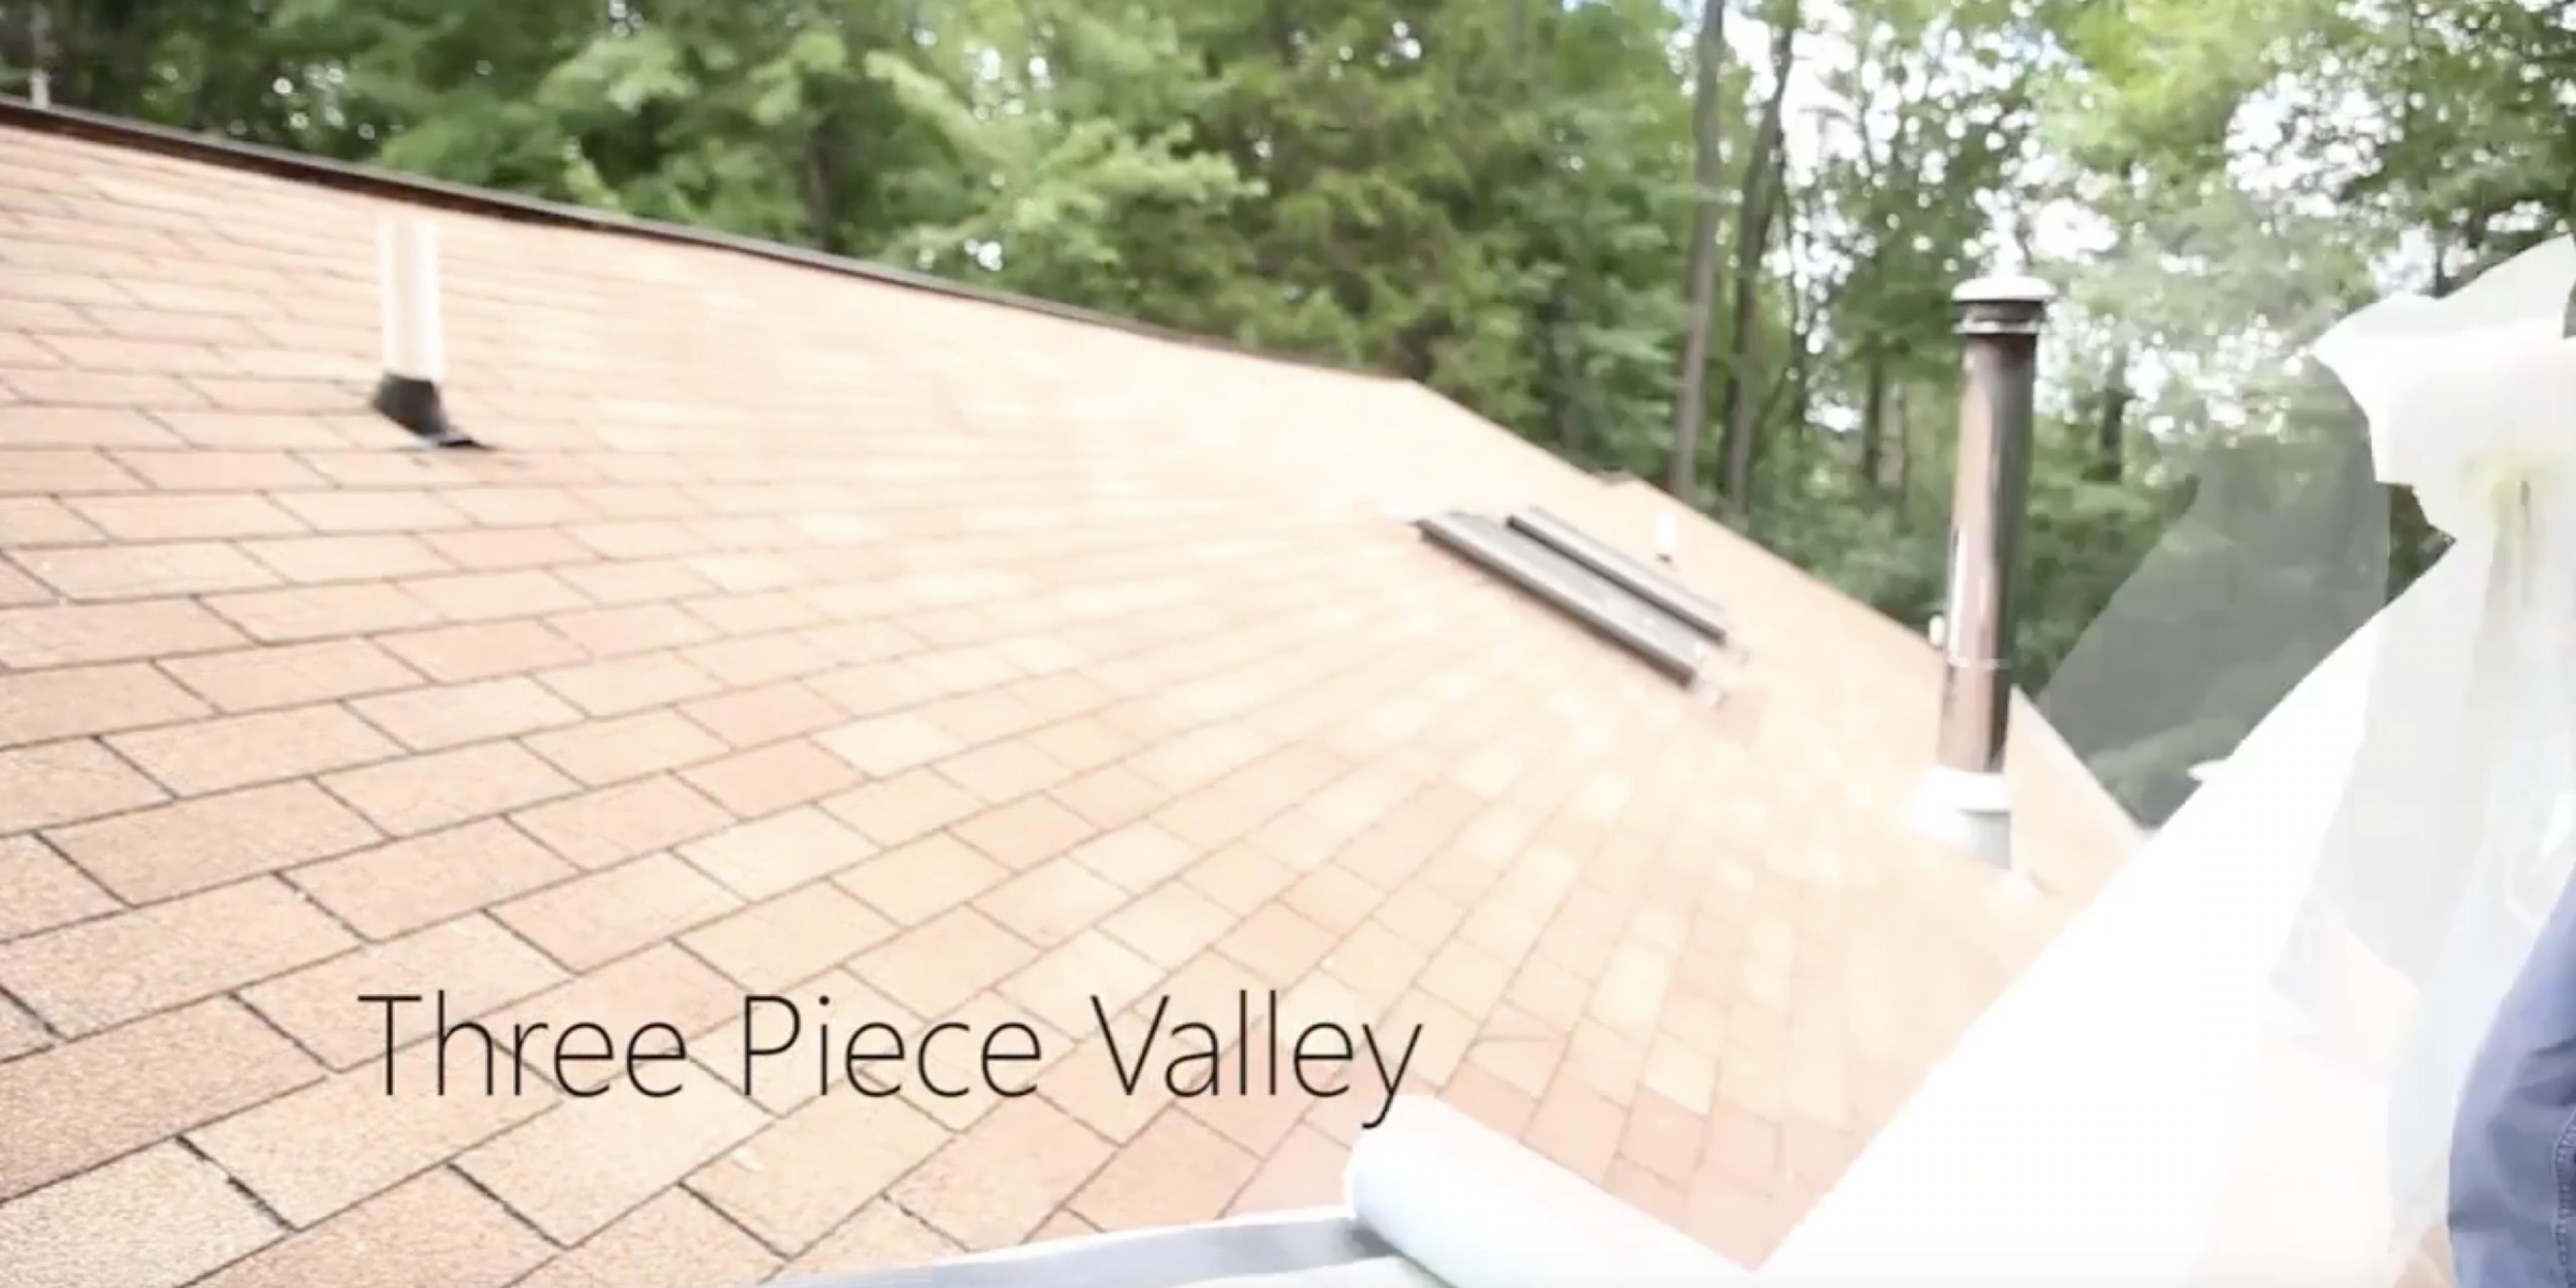 Tile Three Piece Valley Installation Matterhorn Metal Roofing